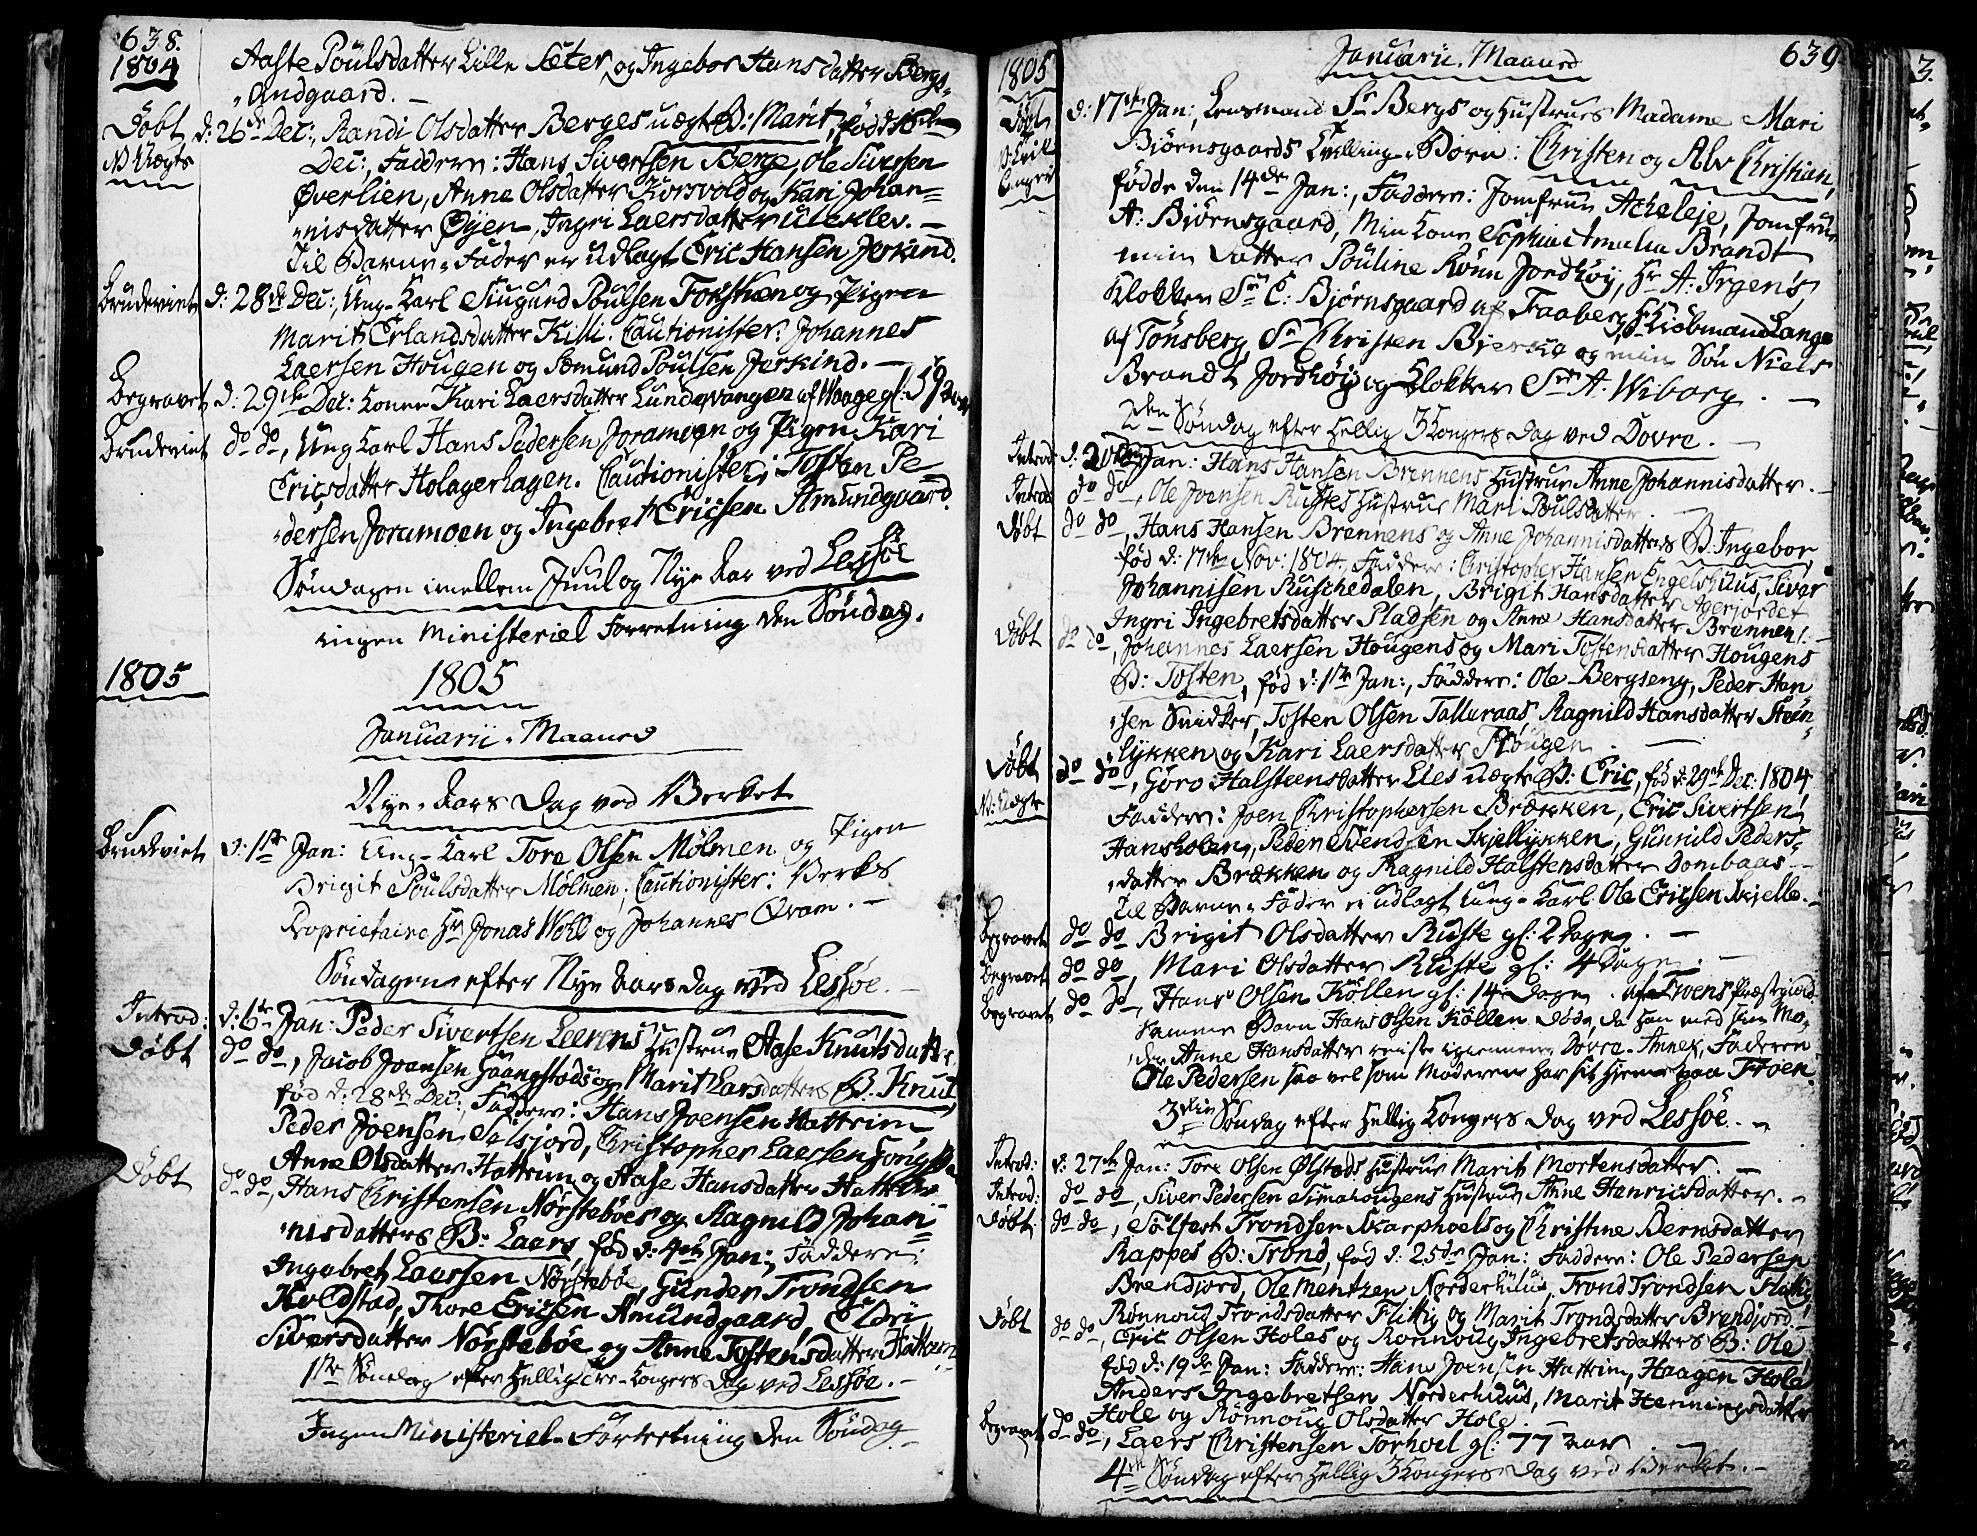 SAH, Lesja prestekontor, Ministerialbok nr. 3, 1777-1819, s. 638-639